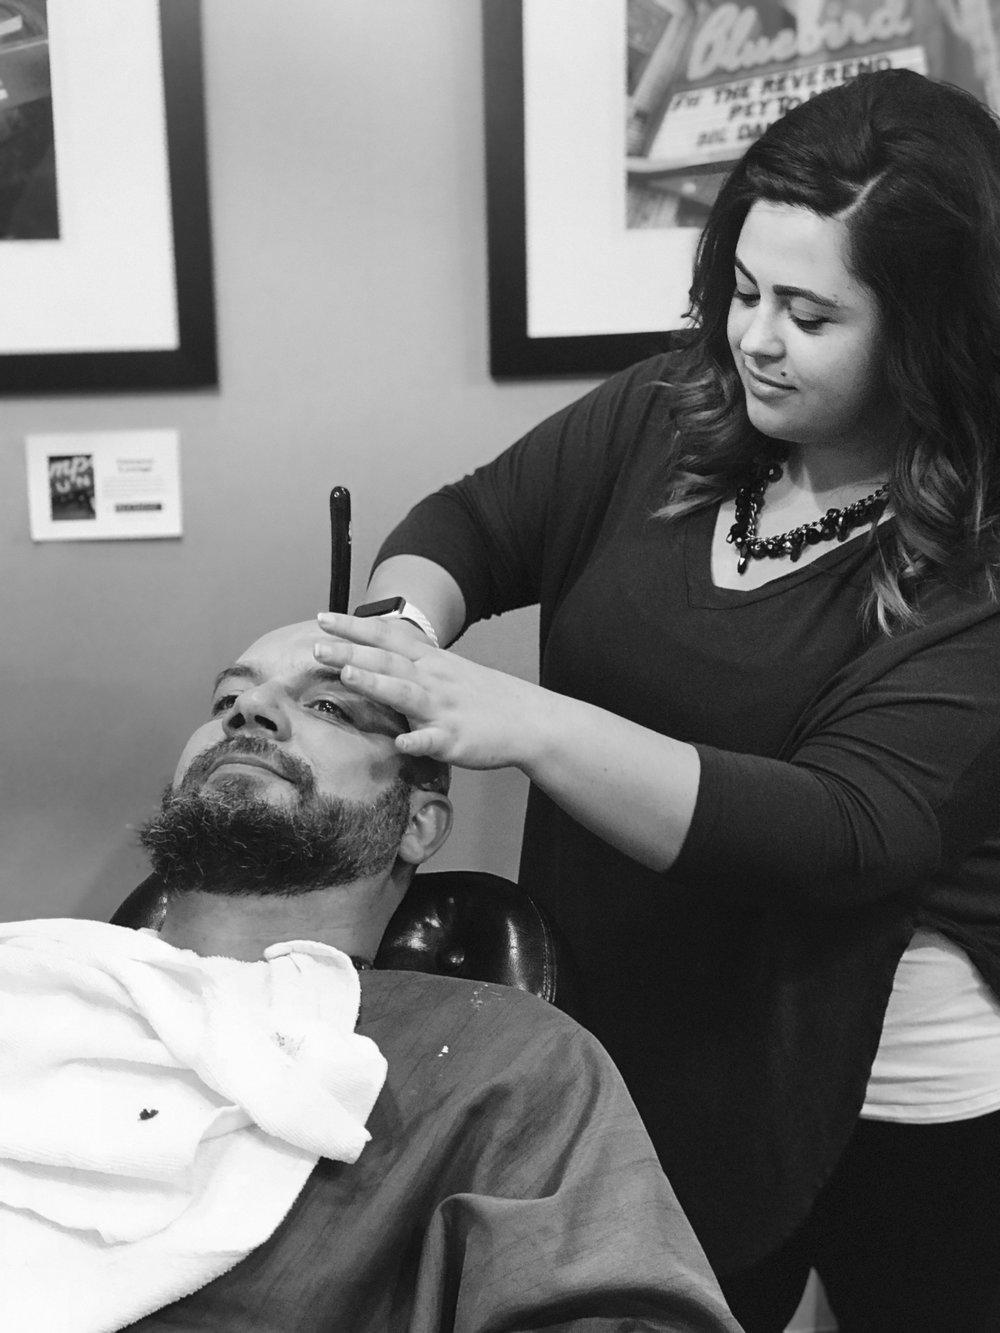 Lauren starts simple haircuts for men